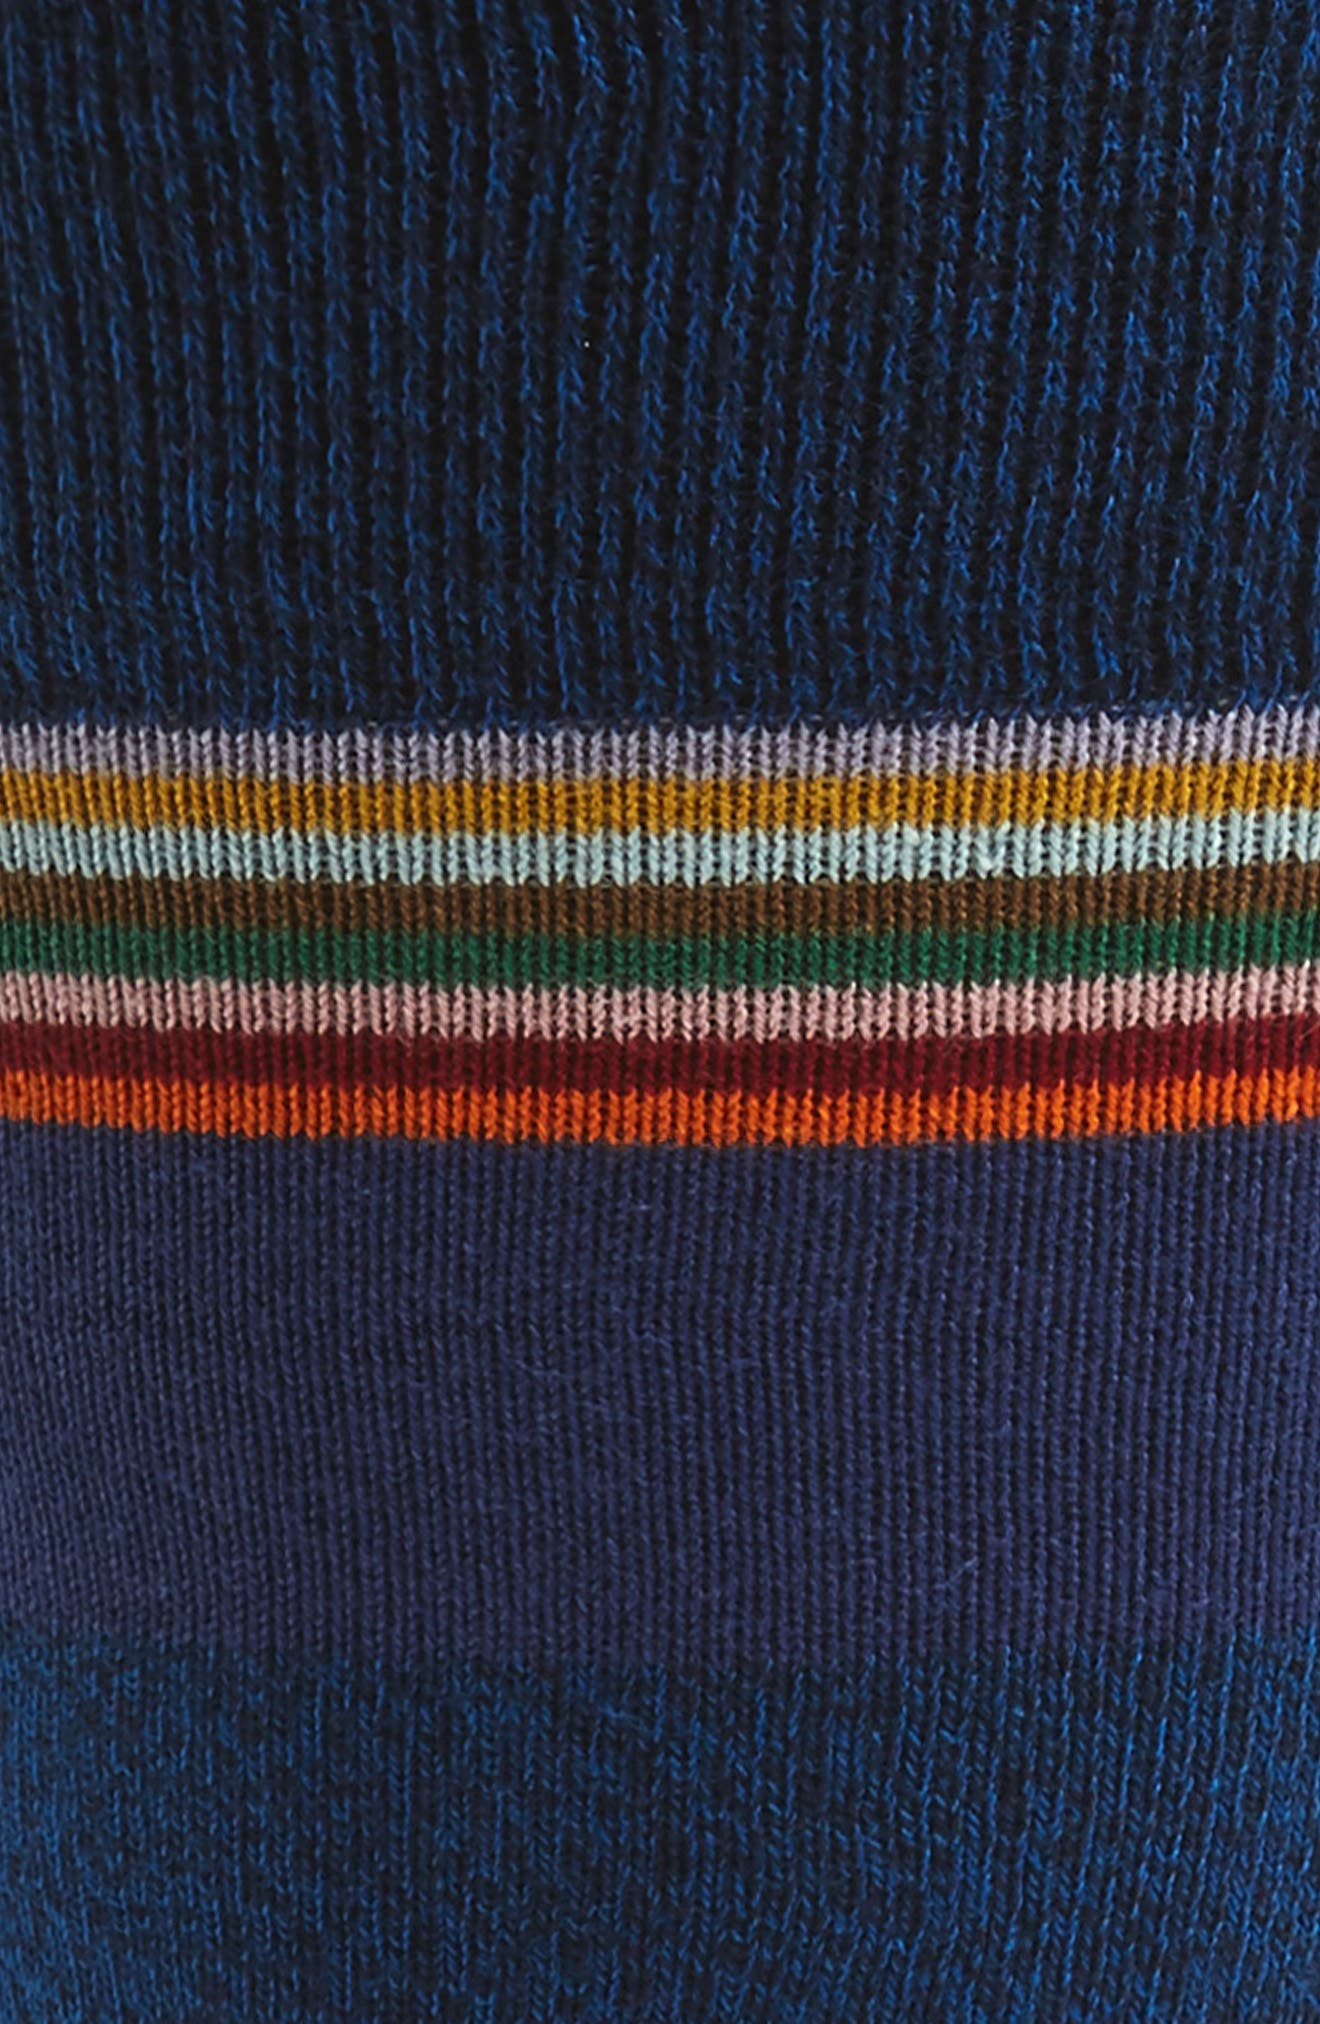 Stripe Socks,                             Alternate thumbnail 5, color,